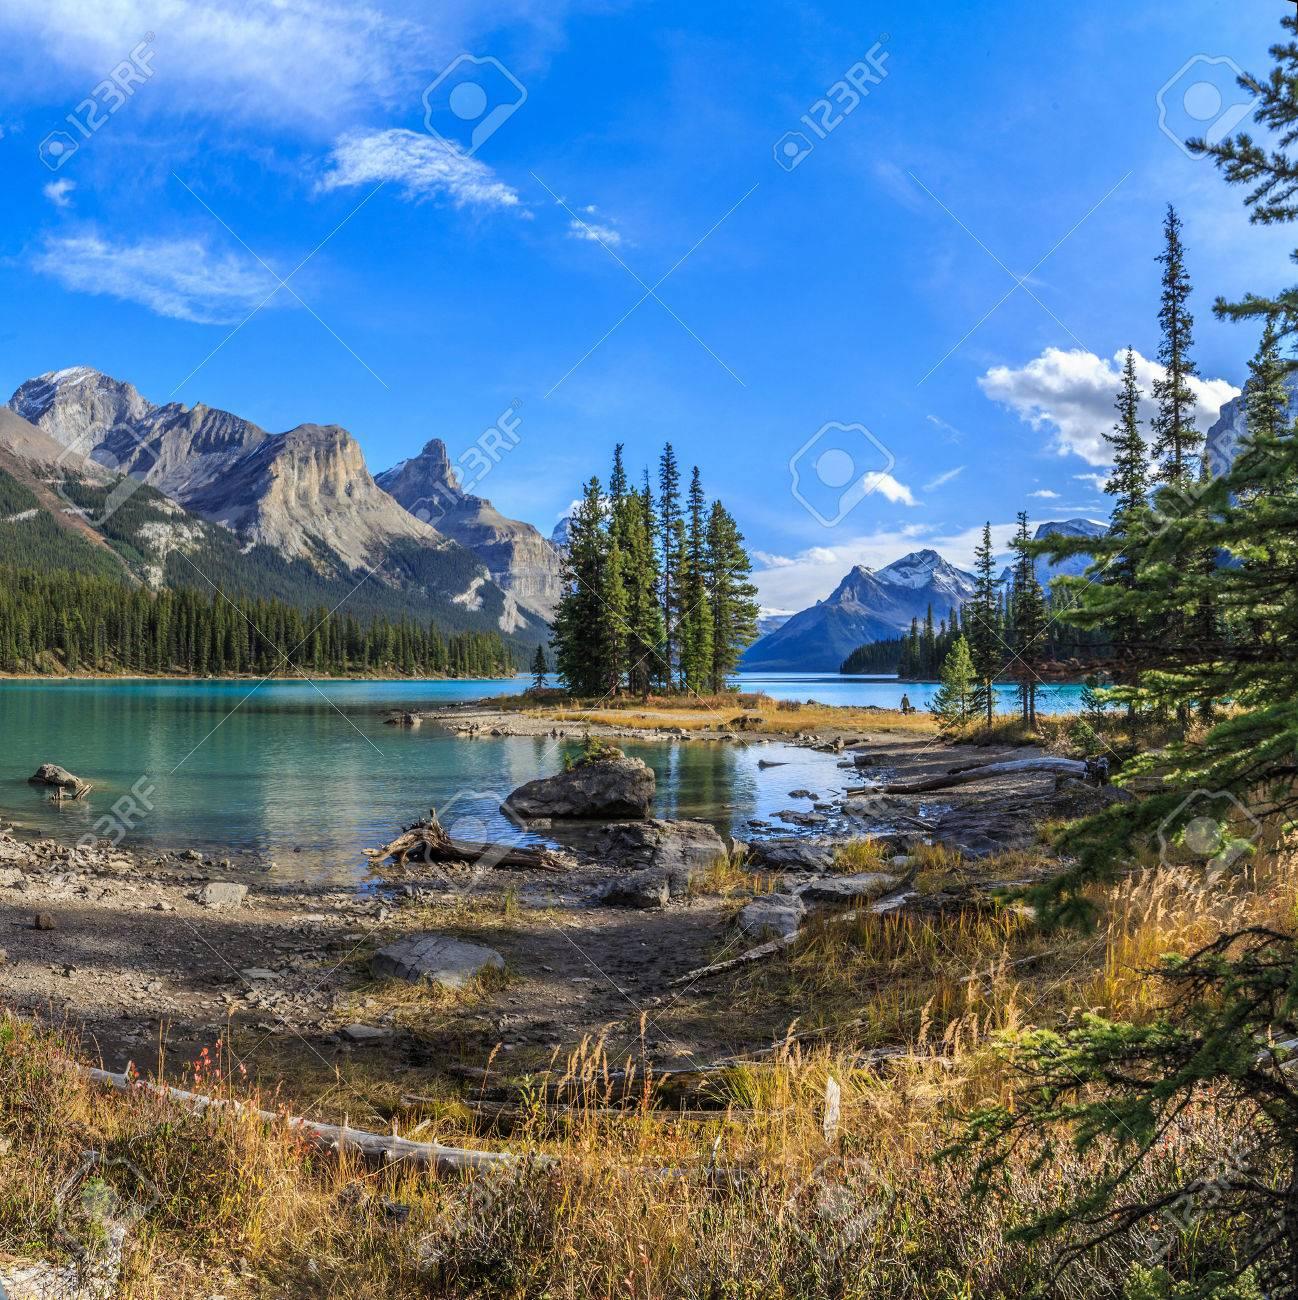 Spirit Island in Maligne Lake, Jasper National Park, Alberta, Canada - 33705092